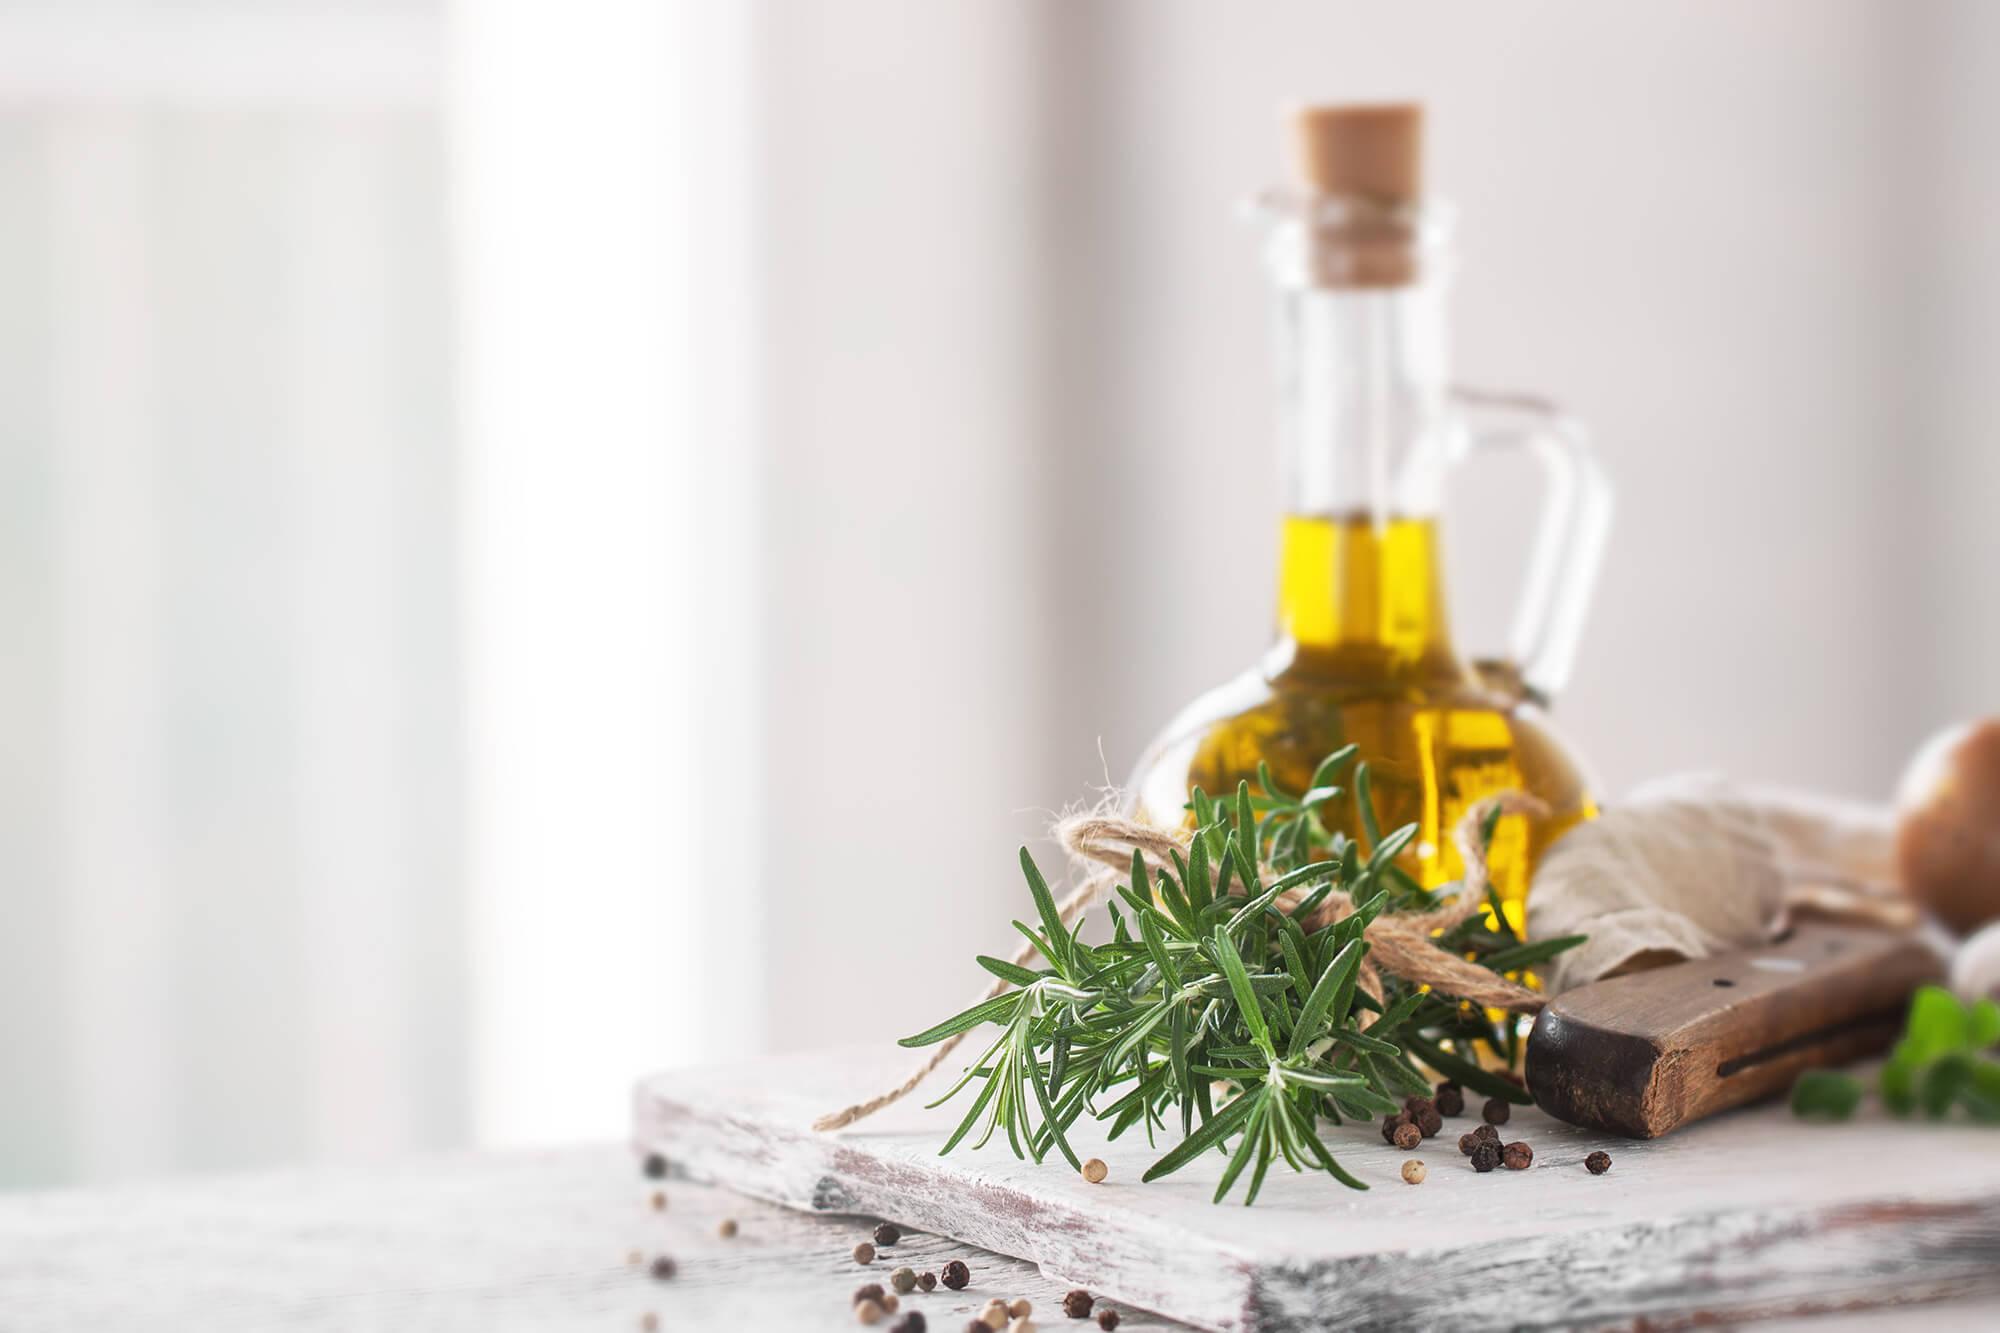 MCT油與椰子油一樣嗎?MCT油功效、用法與副作用介紹!